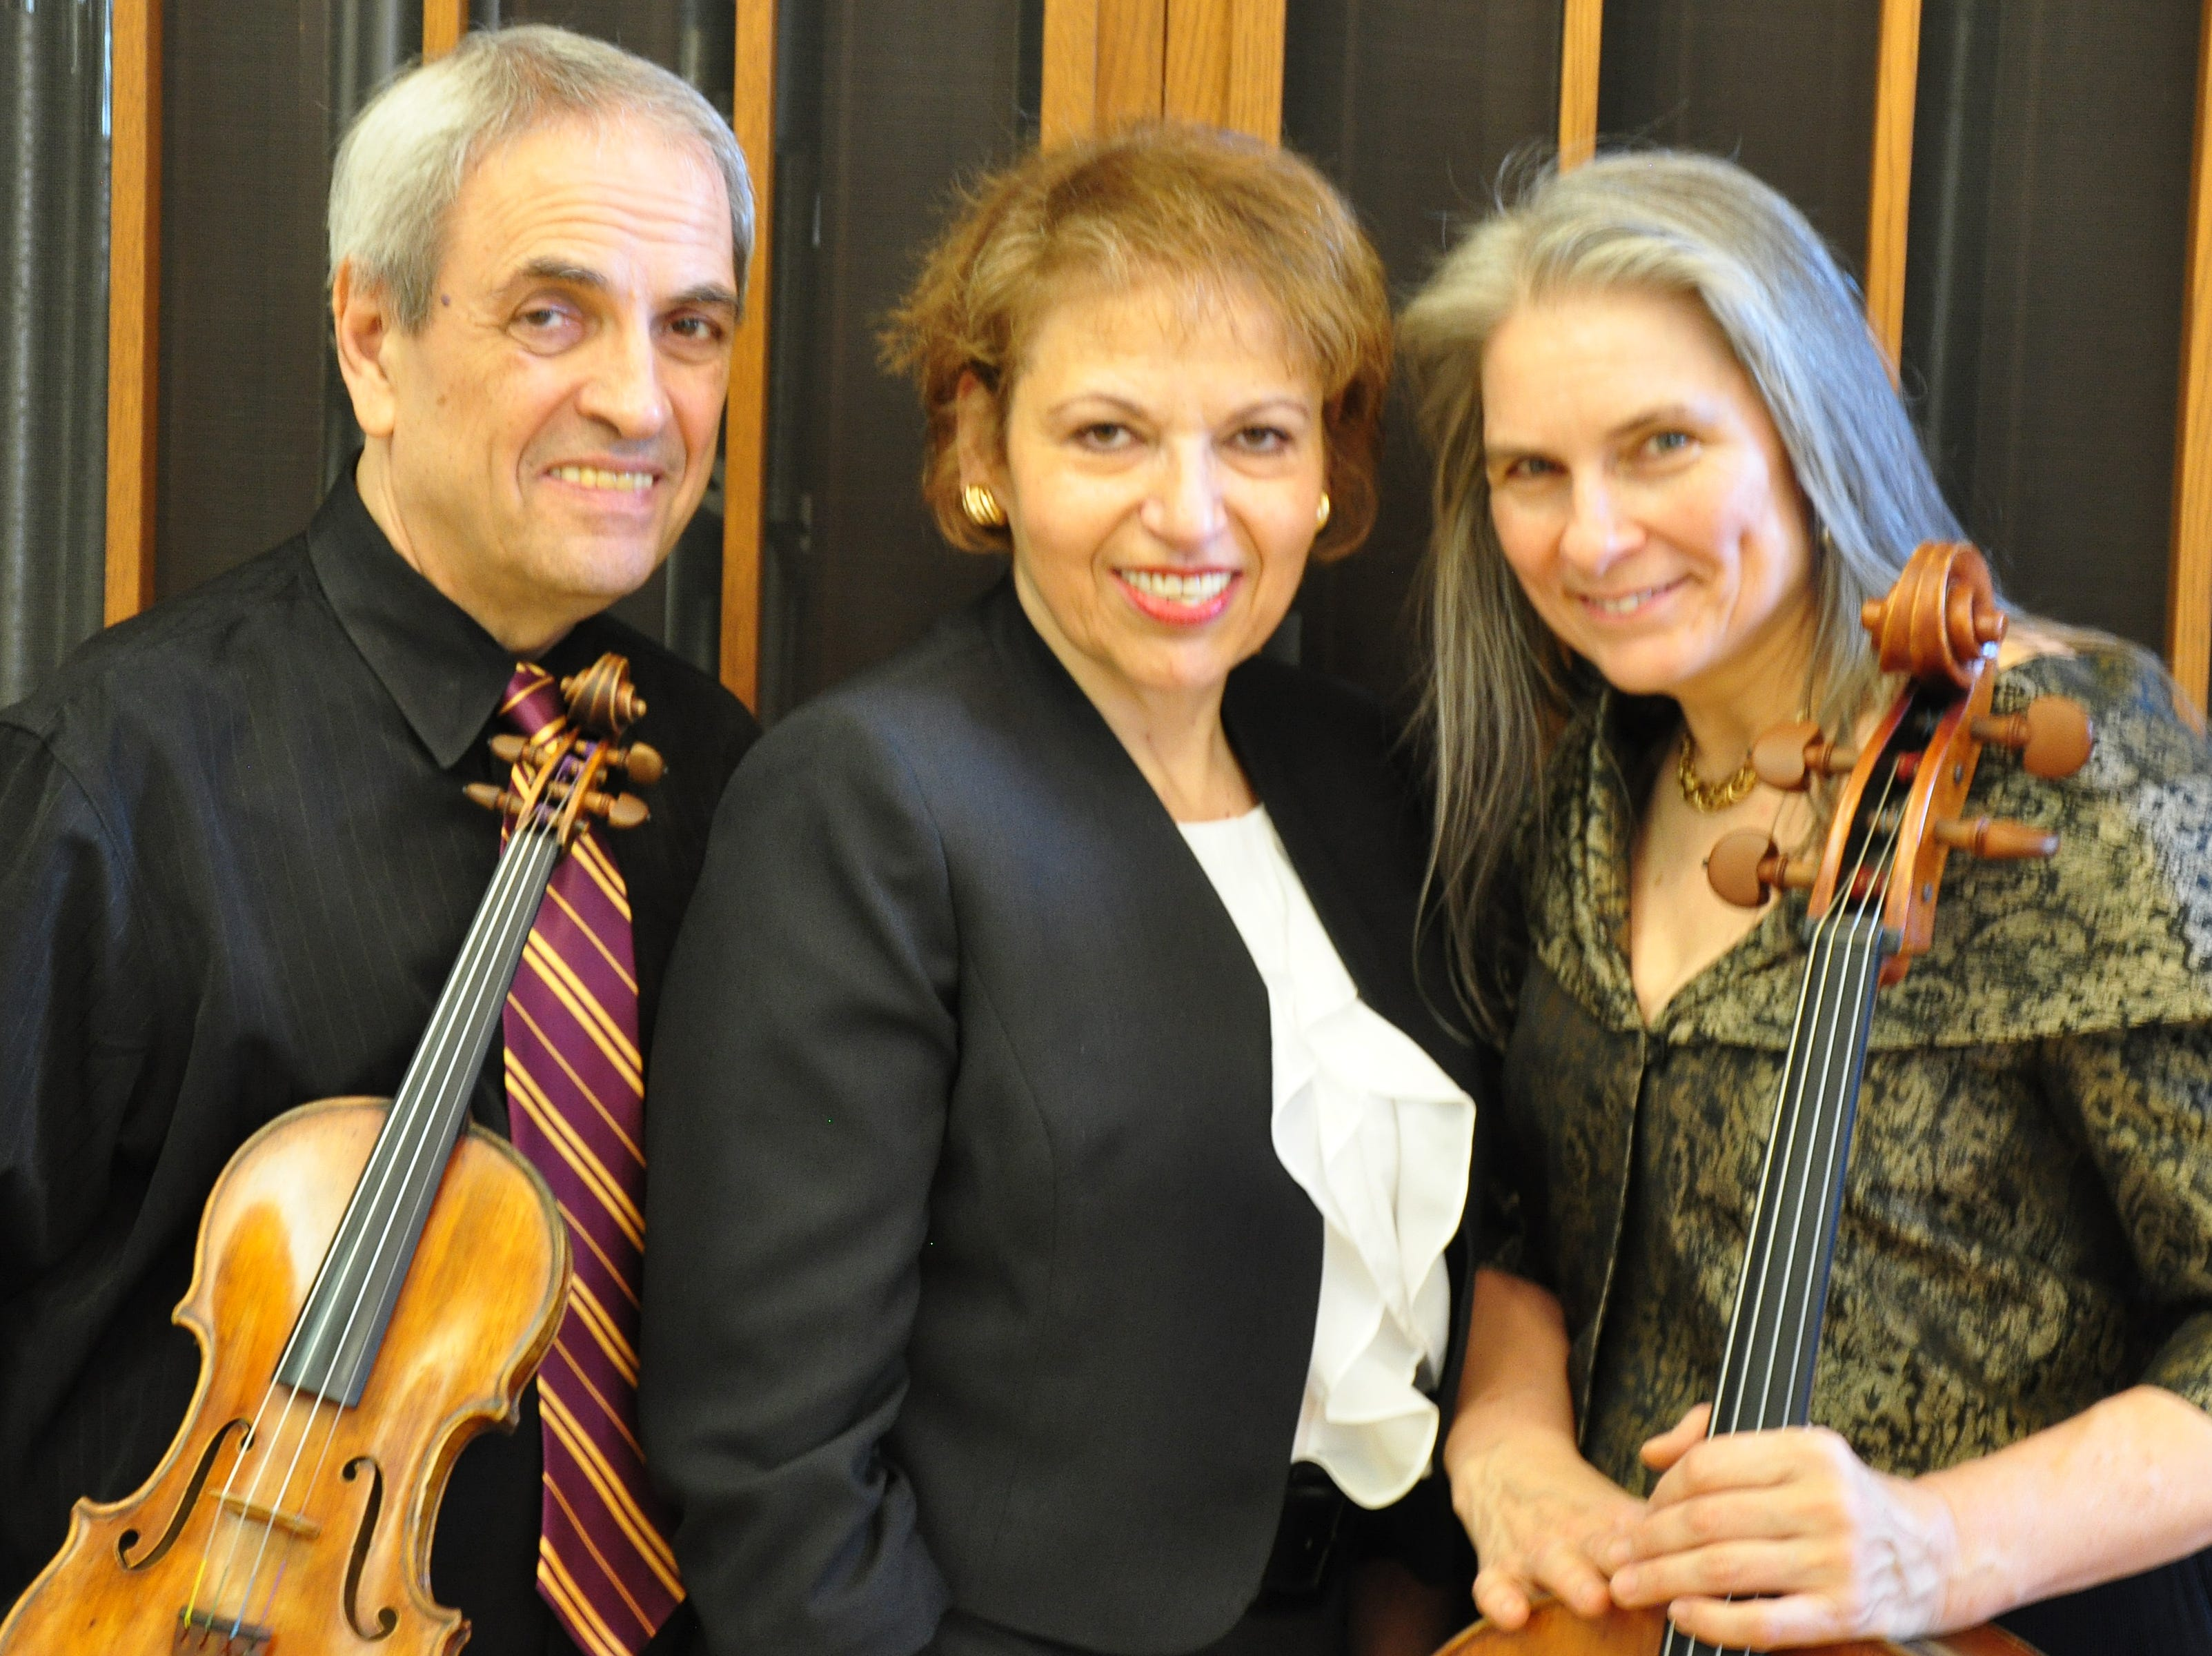 The Arcadian Trio, featuring (left to right) violinist Igor Szwec, pianist Diane Goldsmith, and cellist Vivian Barton Dozor.